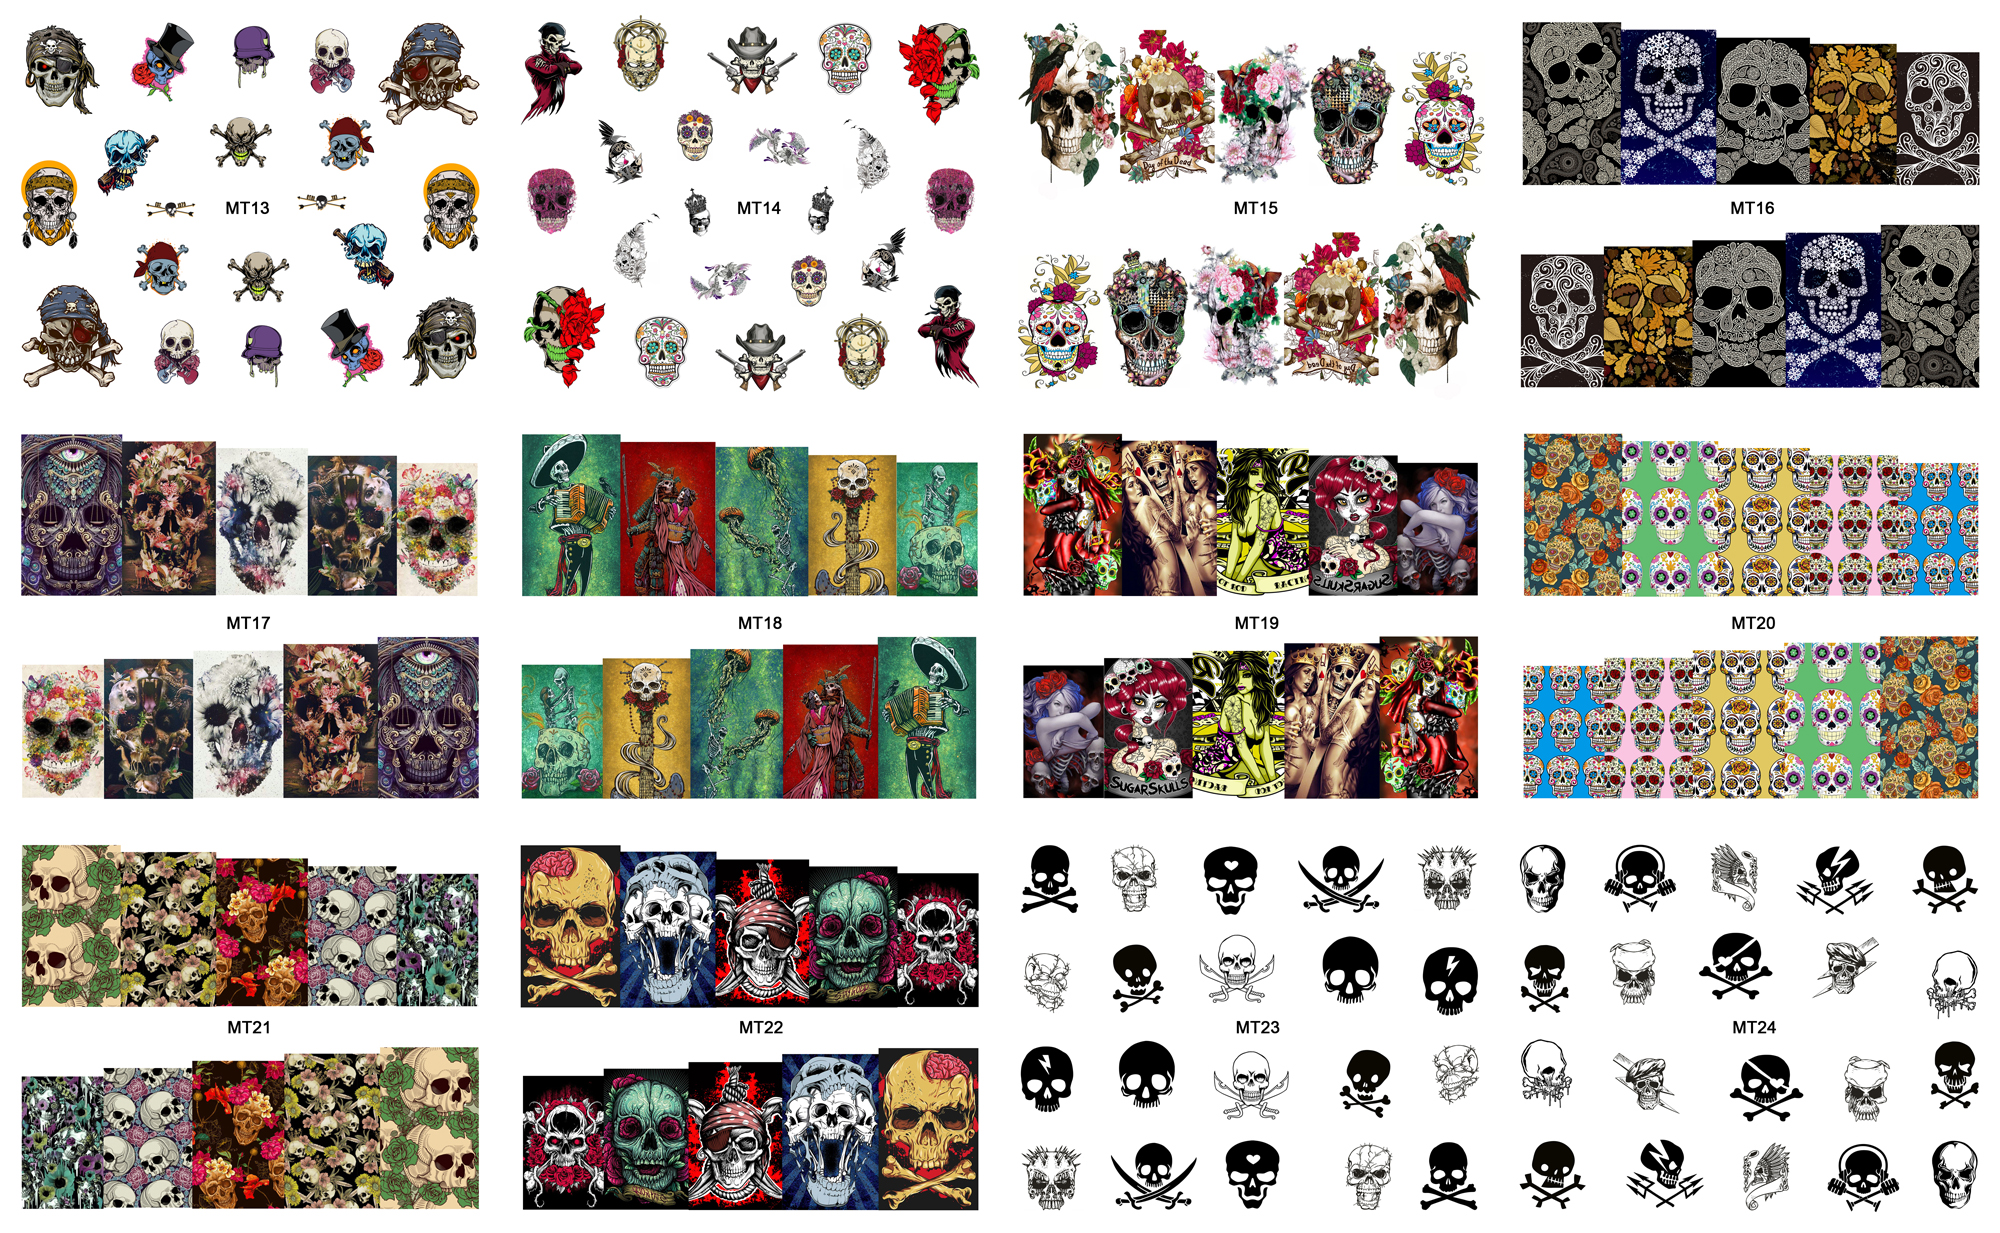 New 12 Sheets/Lot Nail MT13-24 Mix Skull Fashion Nail Art Water Transfer Decal Sticker For Nail Art Tattoo (12 DESIGNS IN 1)(China (Mainland))